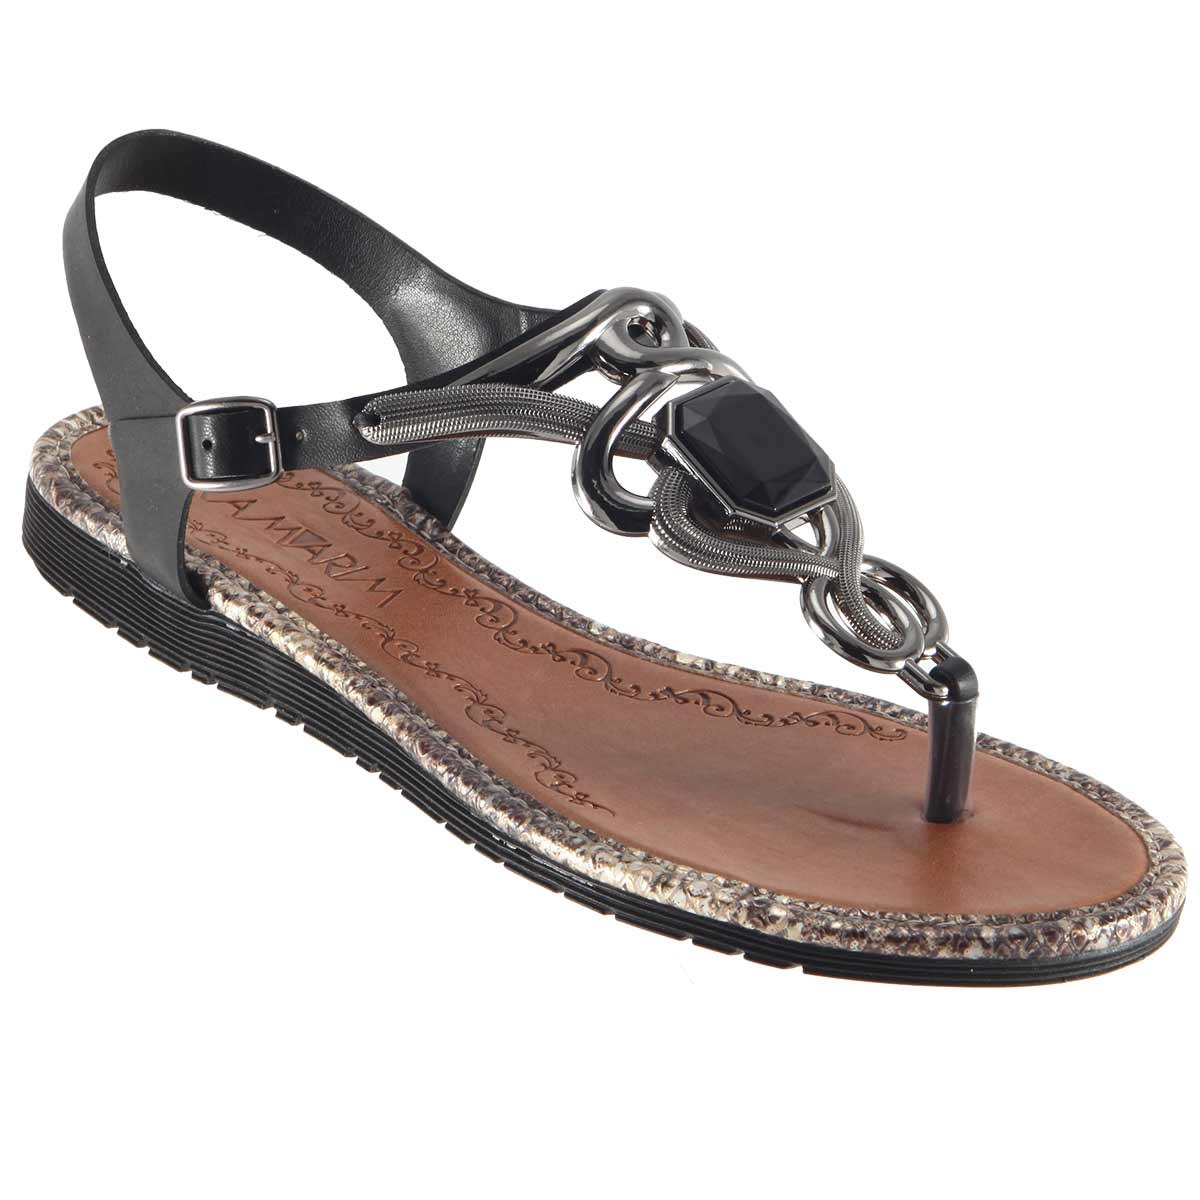 22ac39699 sandália ramarim feminina rasteira salomé 1721202. Carregando zoom.